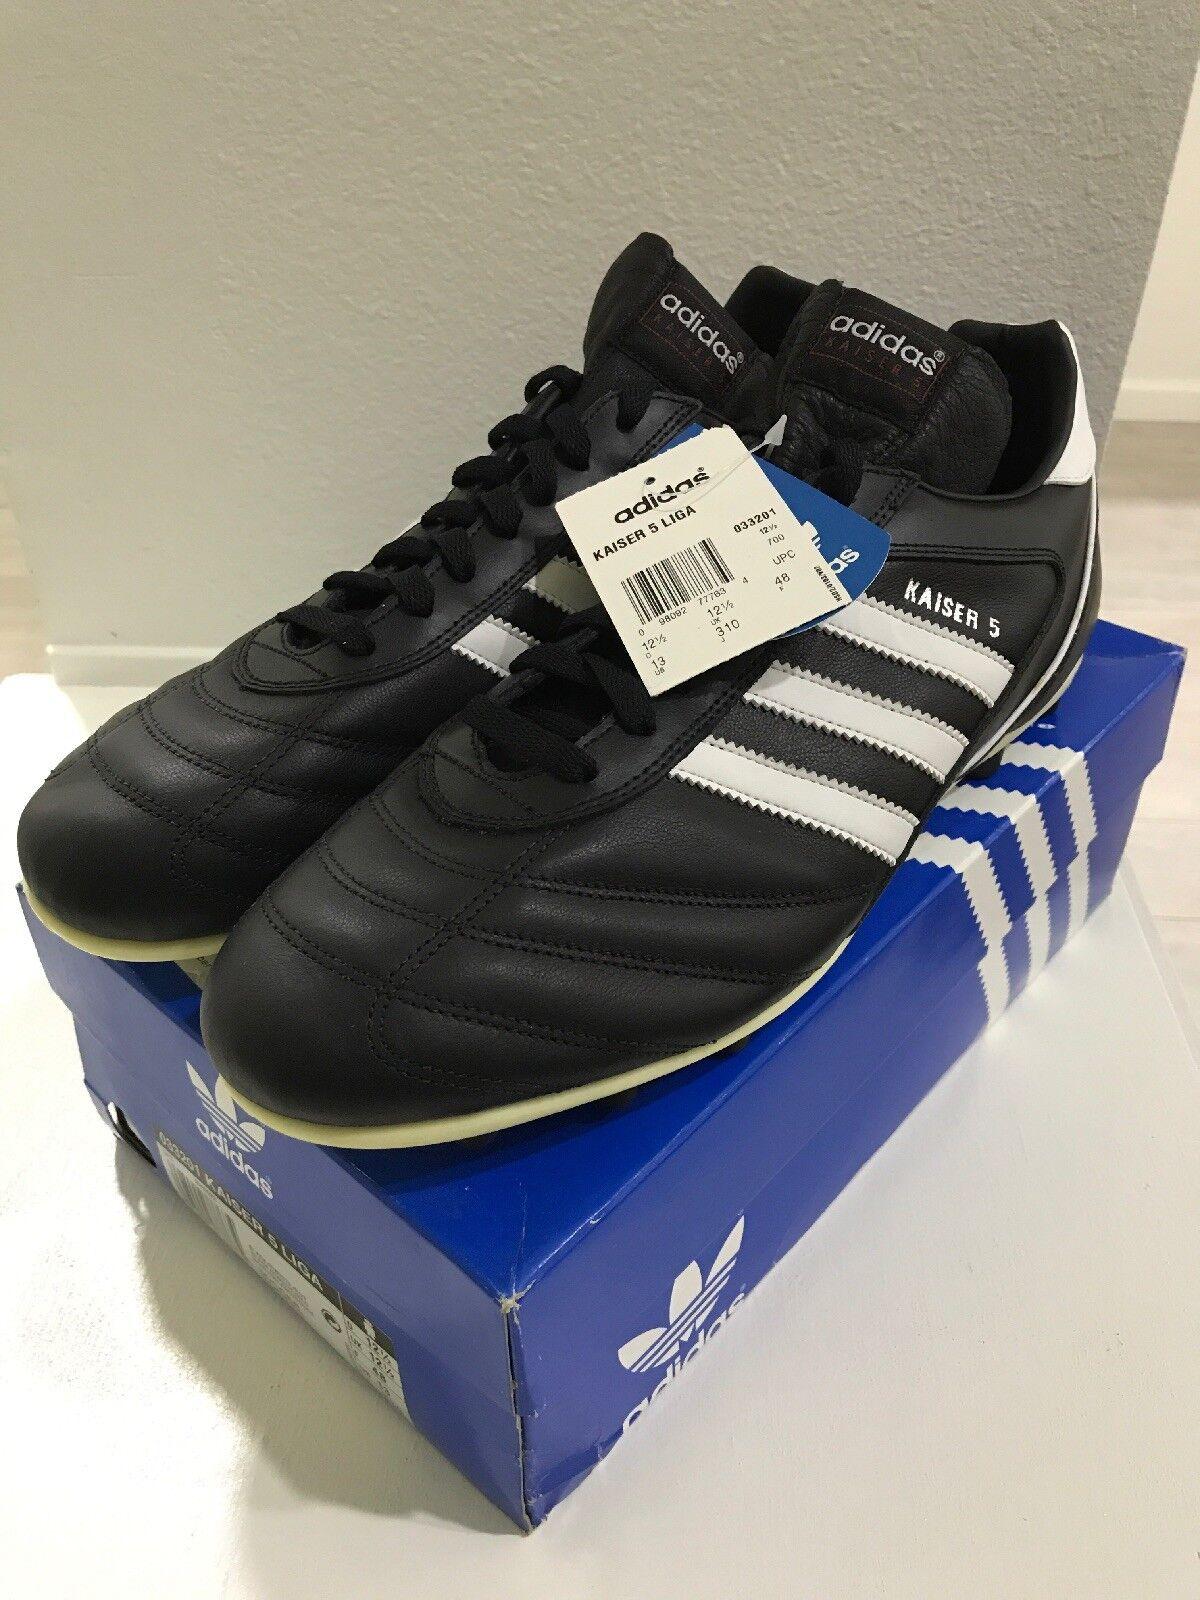 Adidas Kaiser 5 Liga (new) US13 size